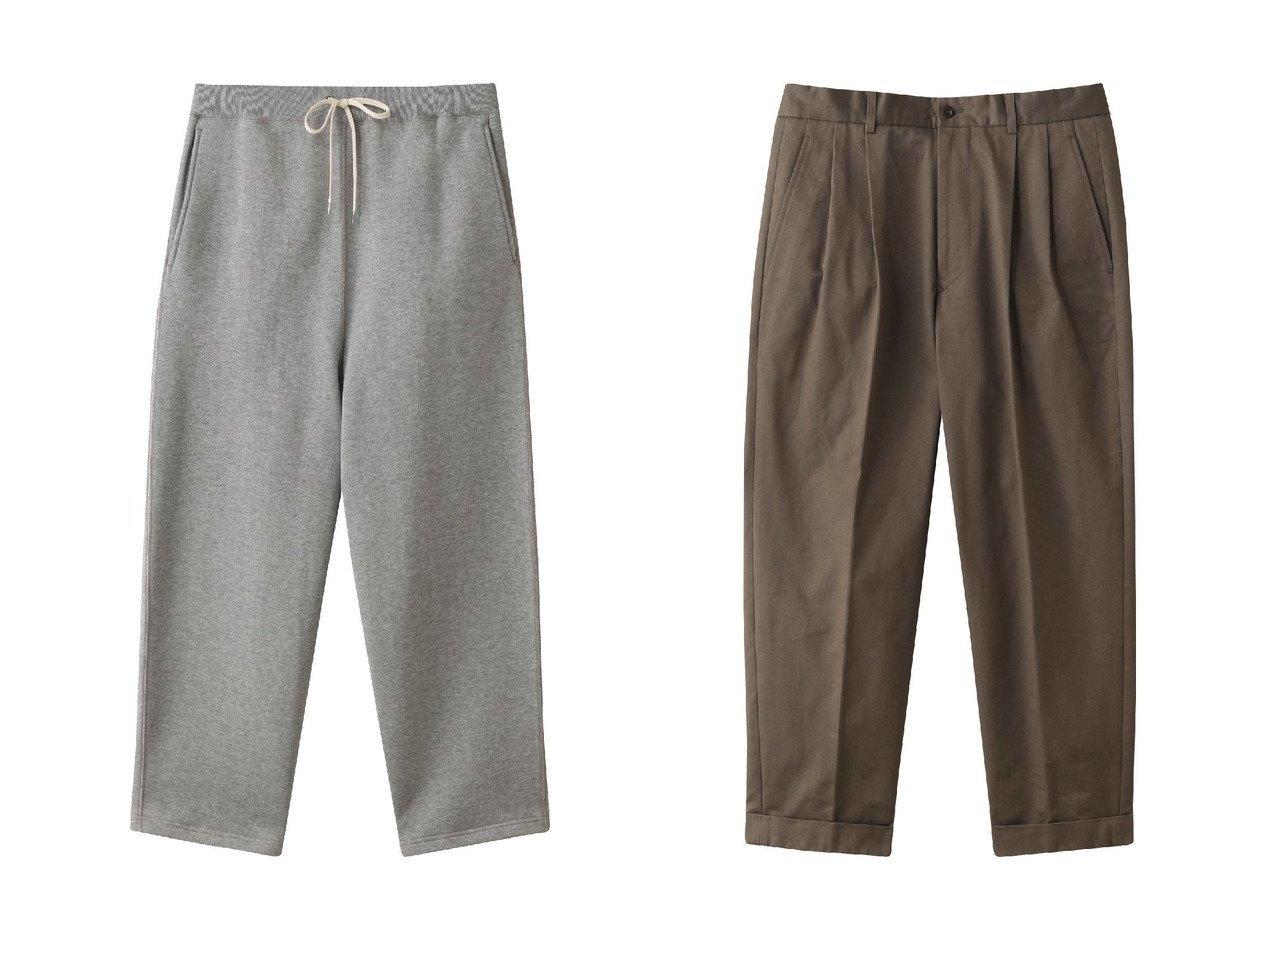 【Scye SCYE BASICS / MEN/サイ サイベーシックス】の【MEN】サンホアキンコットンテーパードプリーツパンツ&【MEN】フリースバックジャージースウェットパンツ 【MEN】Scye SCYE BASICSのおすすめ!人気トレンド・男性、メンズファッションの通販 おすすめで人気の流行・トレンド、ファッションの通販商品 メンズファッション・キッズファッション・インテリア・家具・レディースファッション・服の通販 founy(ファニー) https://founy.com/ ファッション Fashion メンズファッション MEN ボトムス Bottoms Men 2021年 2021 2021 春夏 S/S SS Spring/Summer 2021 S/S 春夏 SS Spring/Summer シンプル 再入荷 Restock/Back in Stock/Re Arrival 春 Spring |ID:crp329100000019448